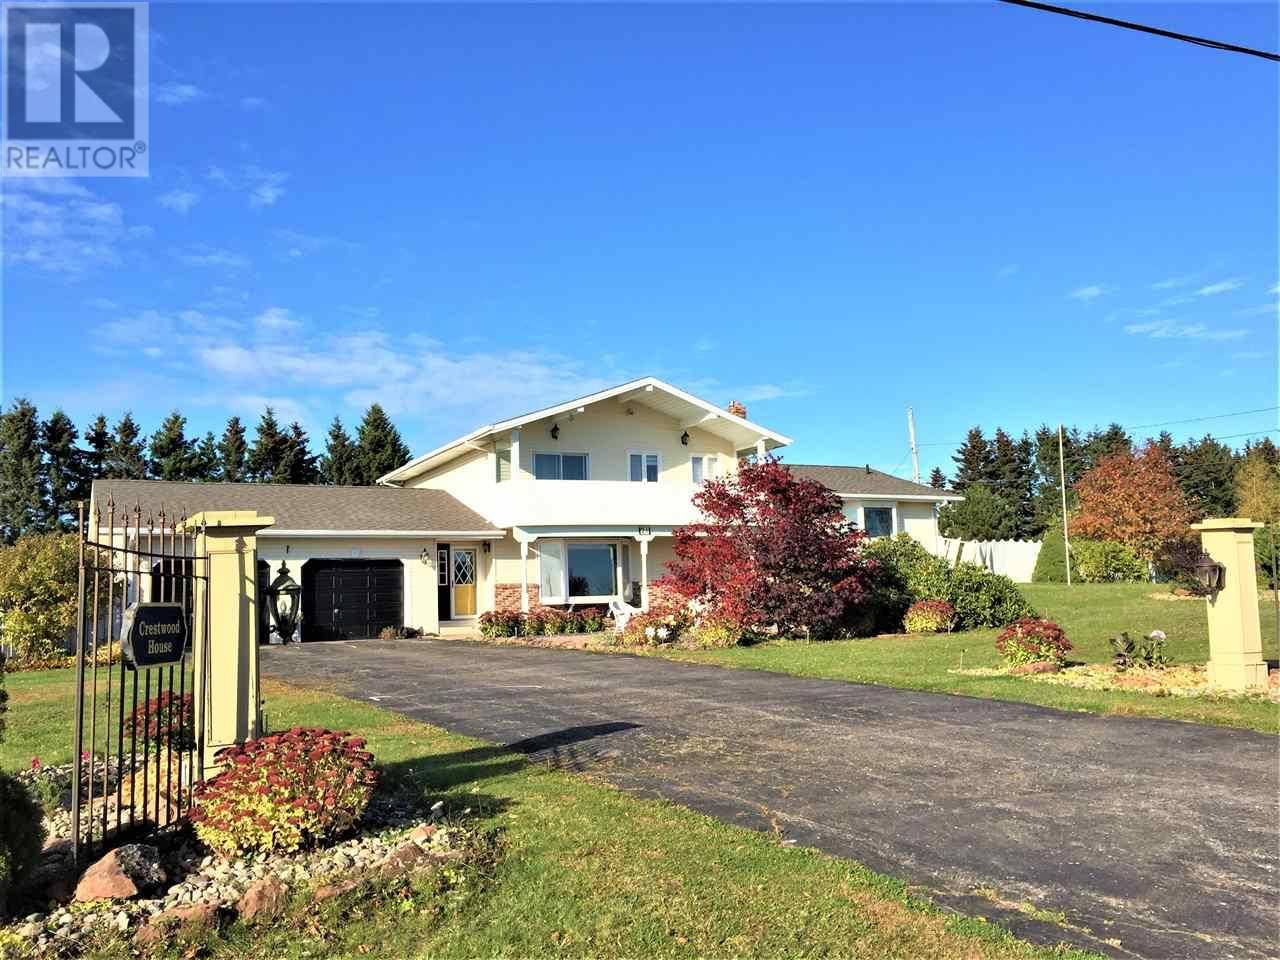 House for sale at 21 Crestwood Ave Stratford Prince Edward Island - MLS: 202000928